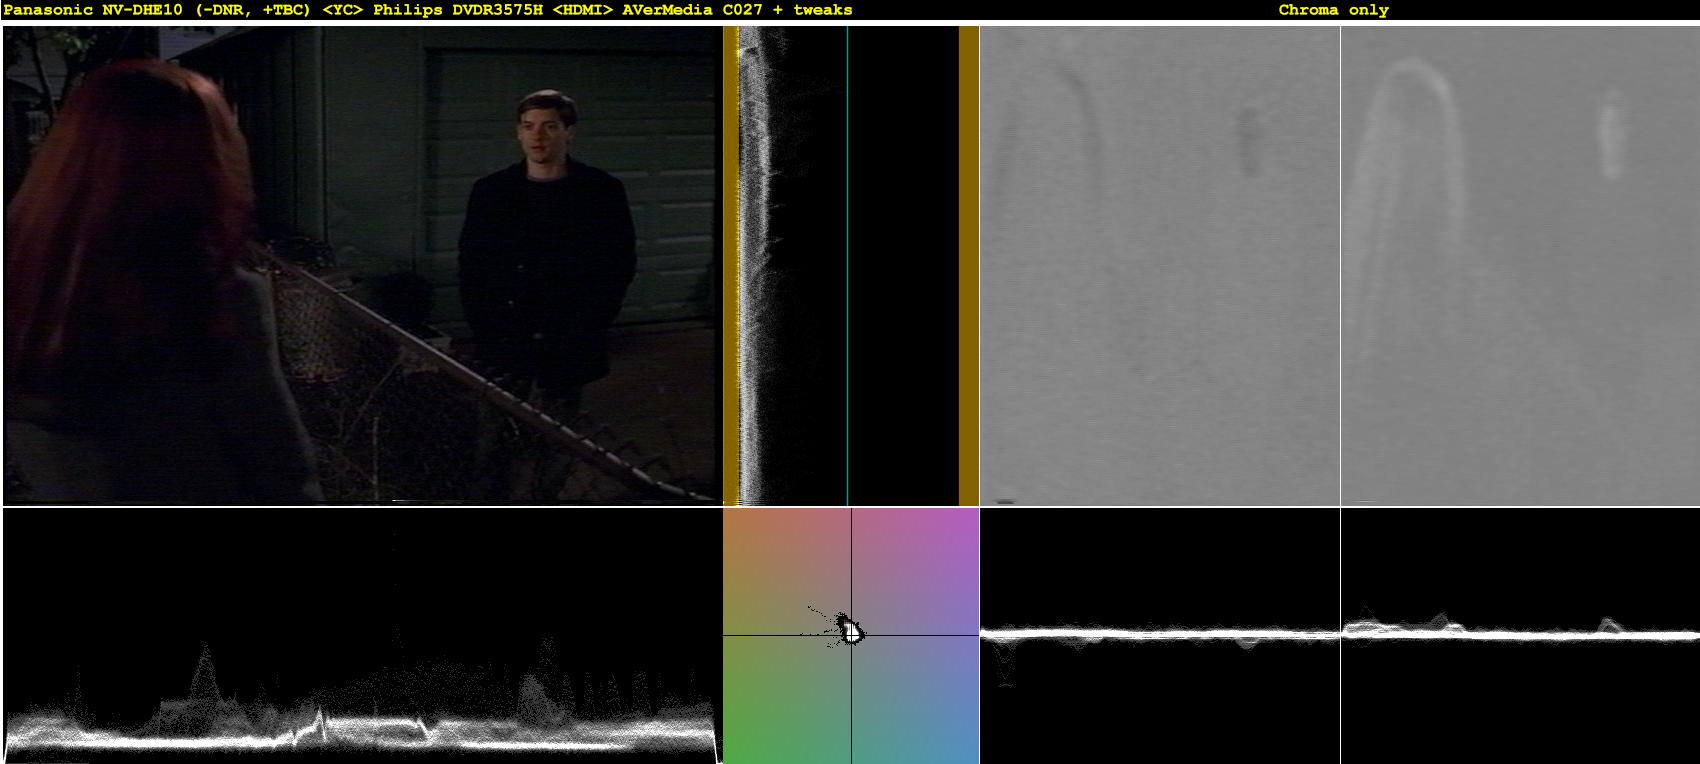 Click image for larger version  Name:0-37-50 - Panasonic NV-DHE10 (-DNR, +TBC).png Views:766 Size:852.2 KB ID:37993